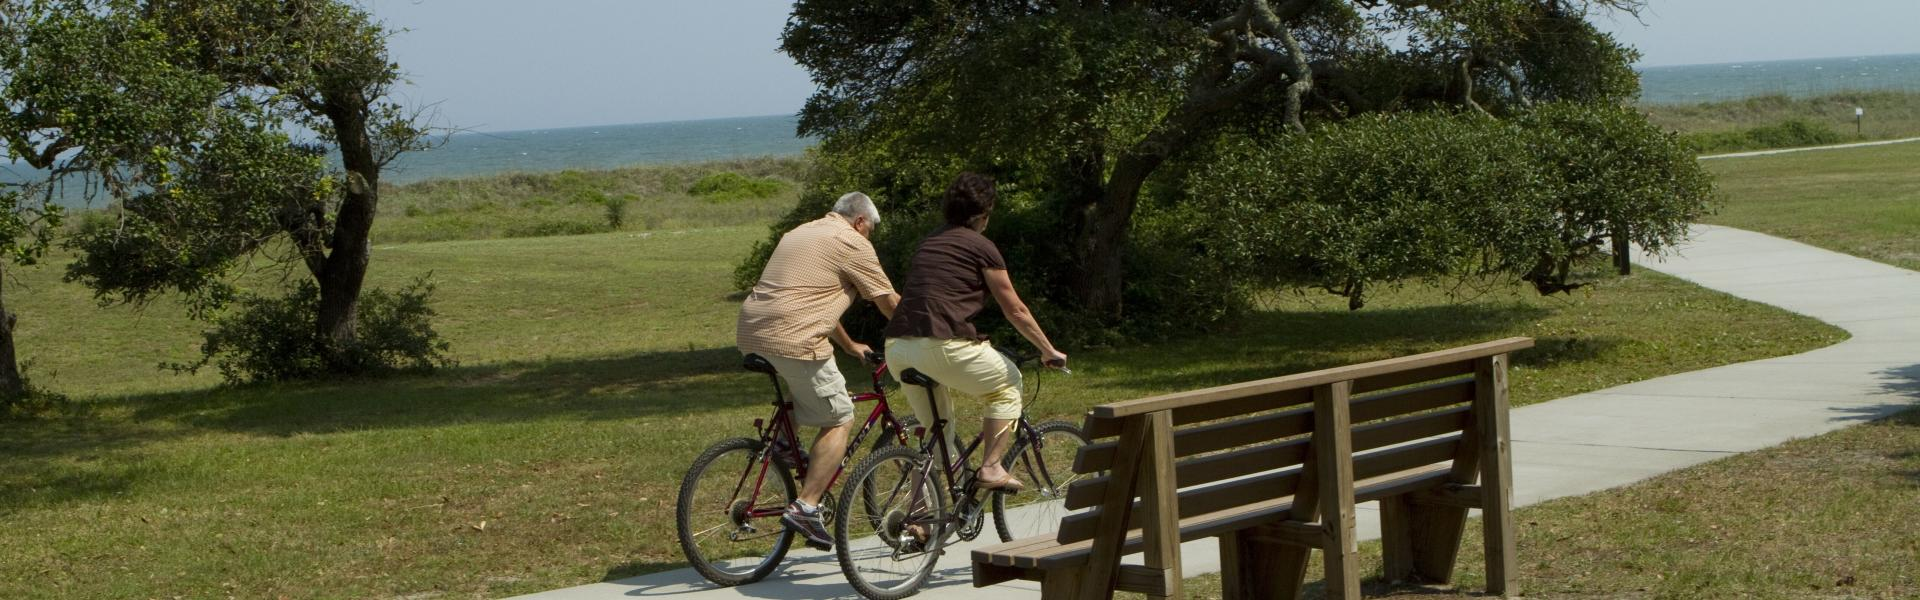 Bike Trails In Myrtle Beach Sc